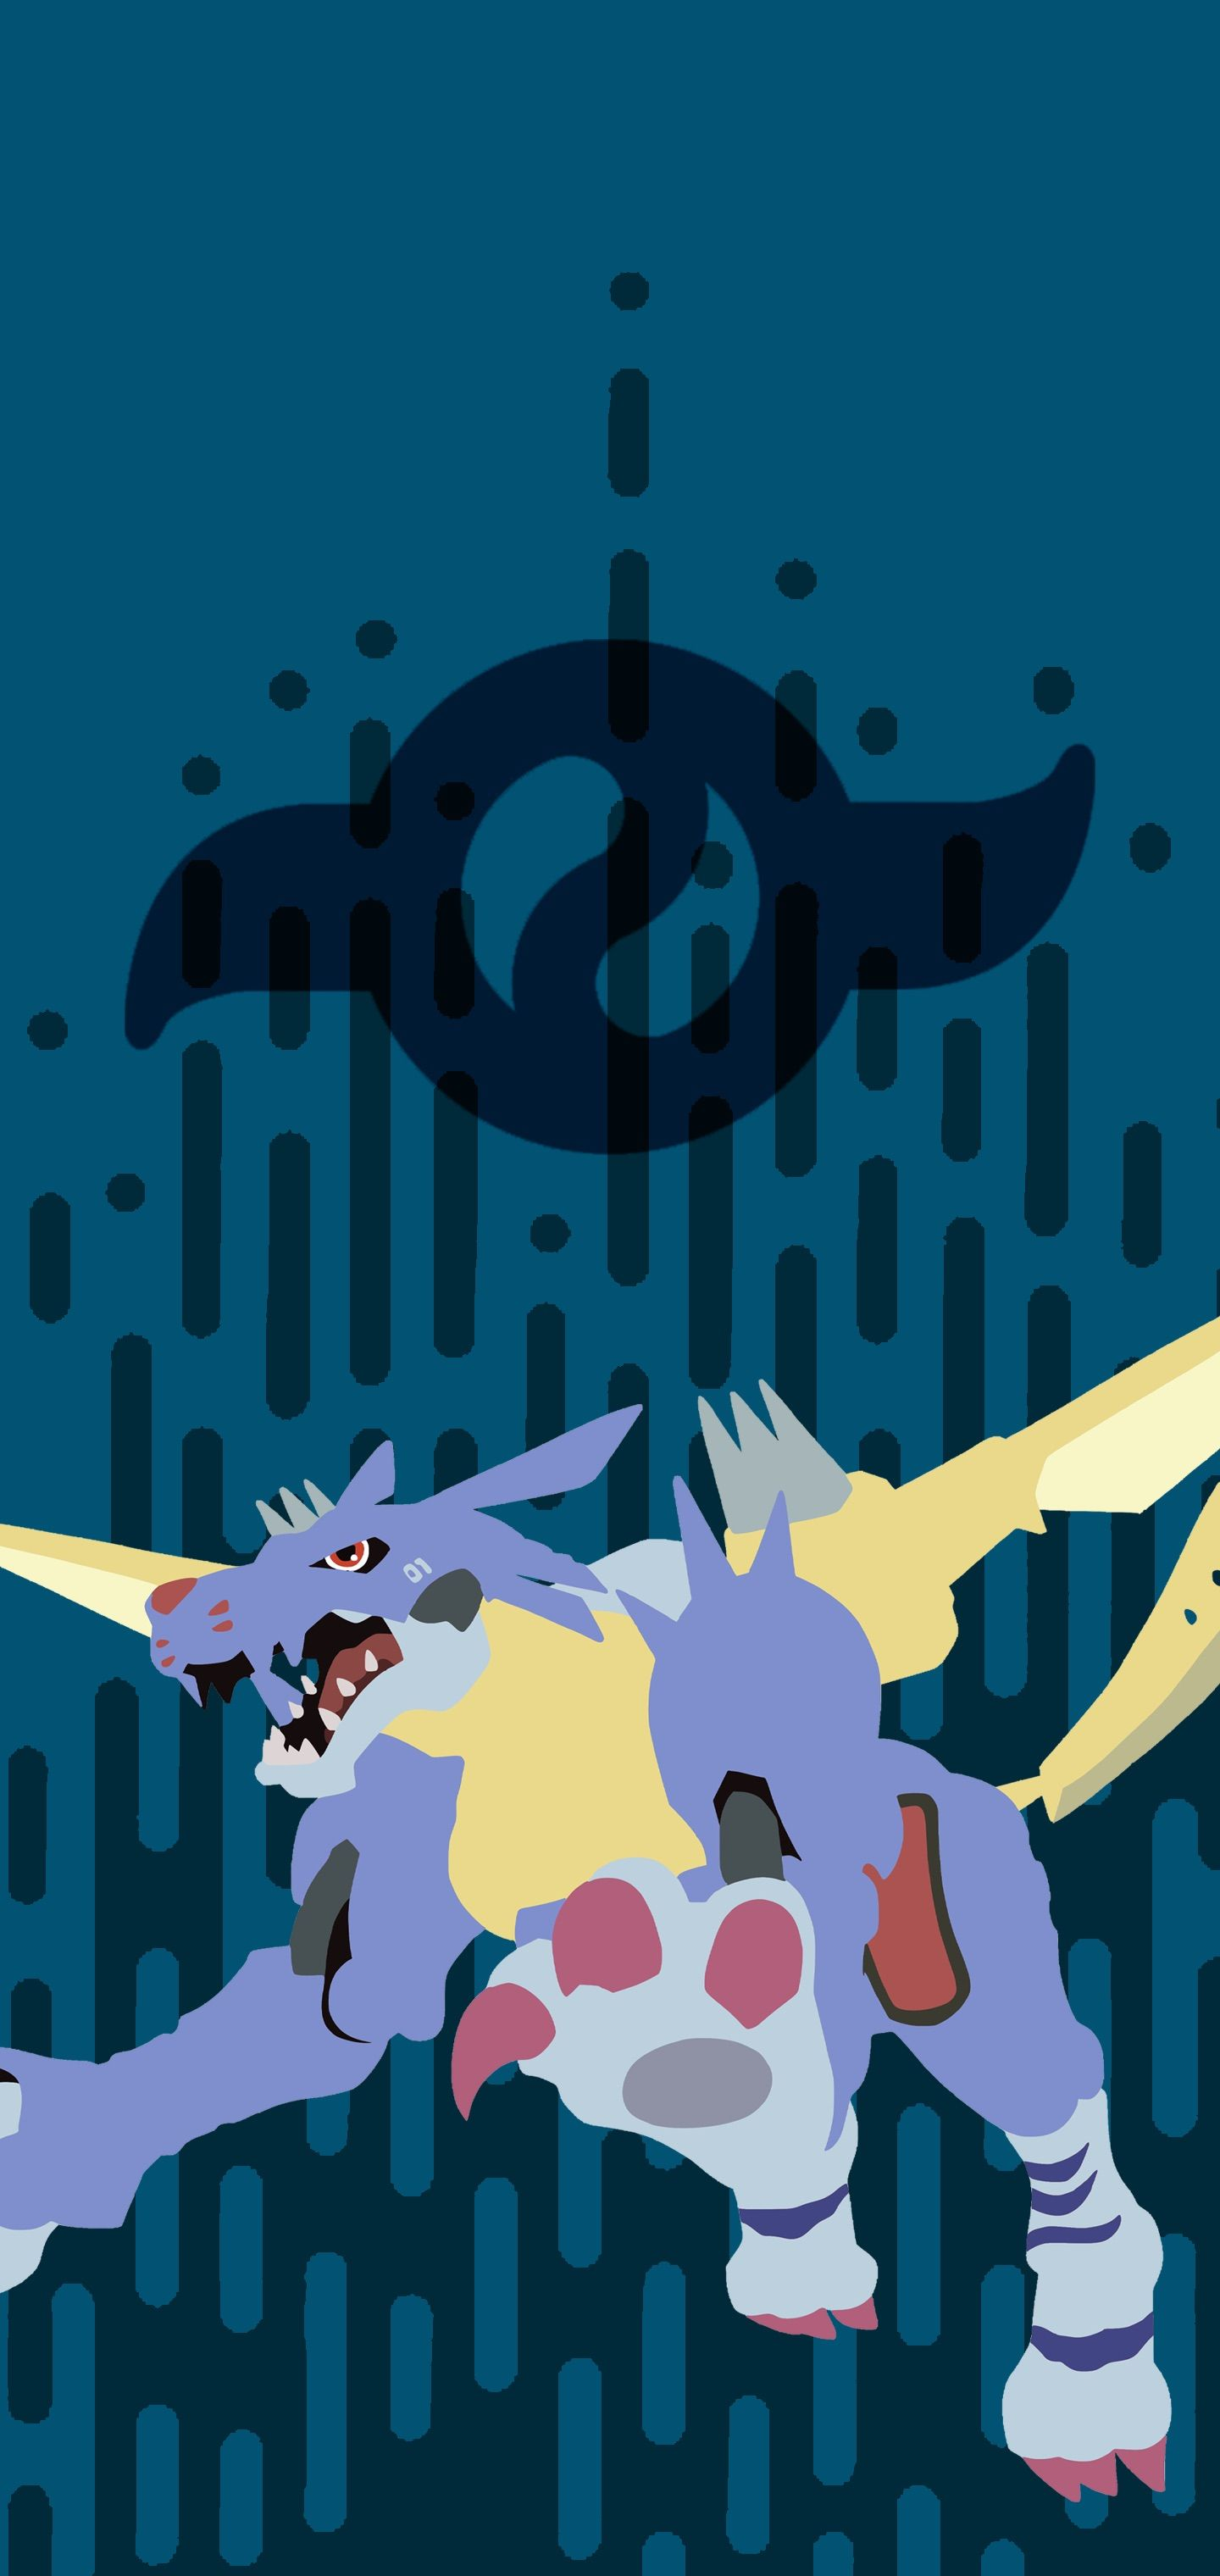 Wallpaper Metalgarurumon In Digimon Wallpaper Digimon Crests Digimon Digital Monsters